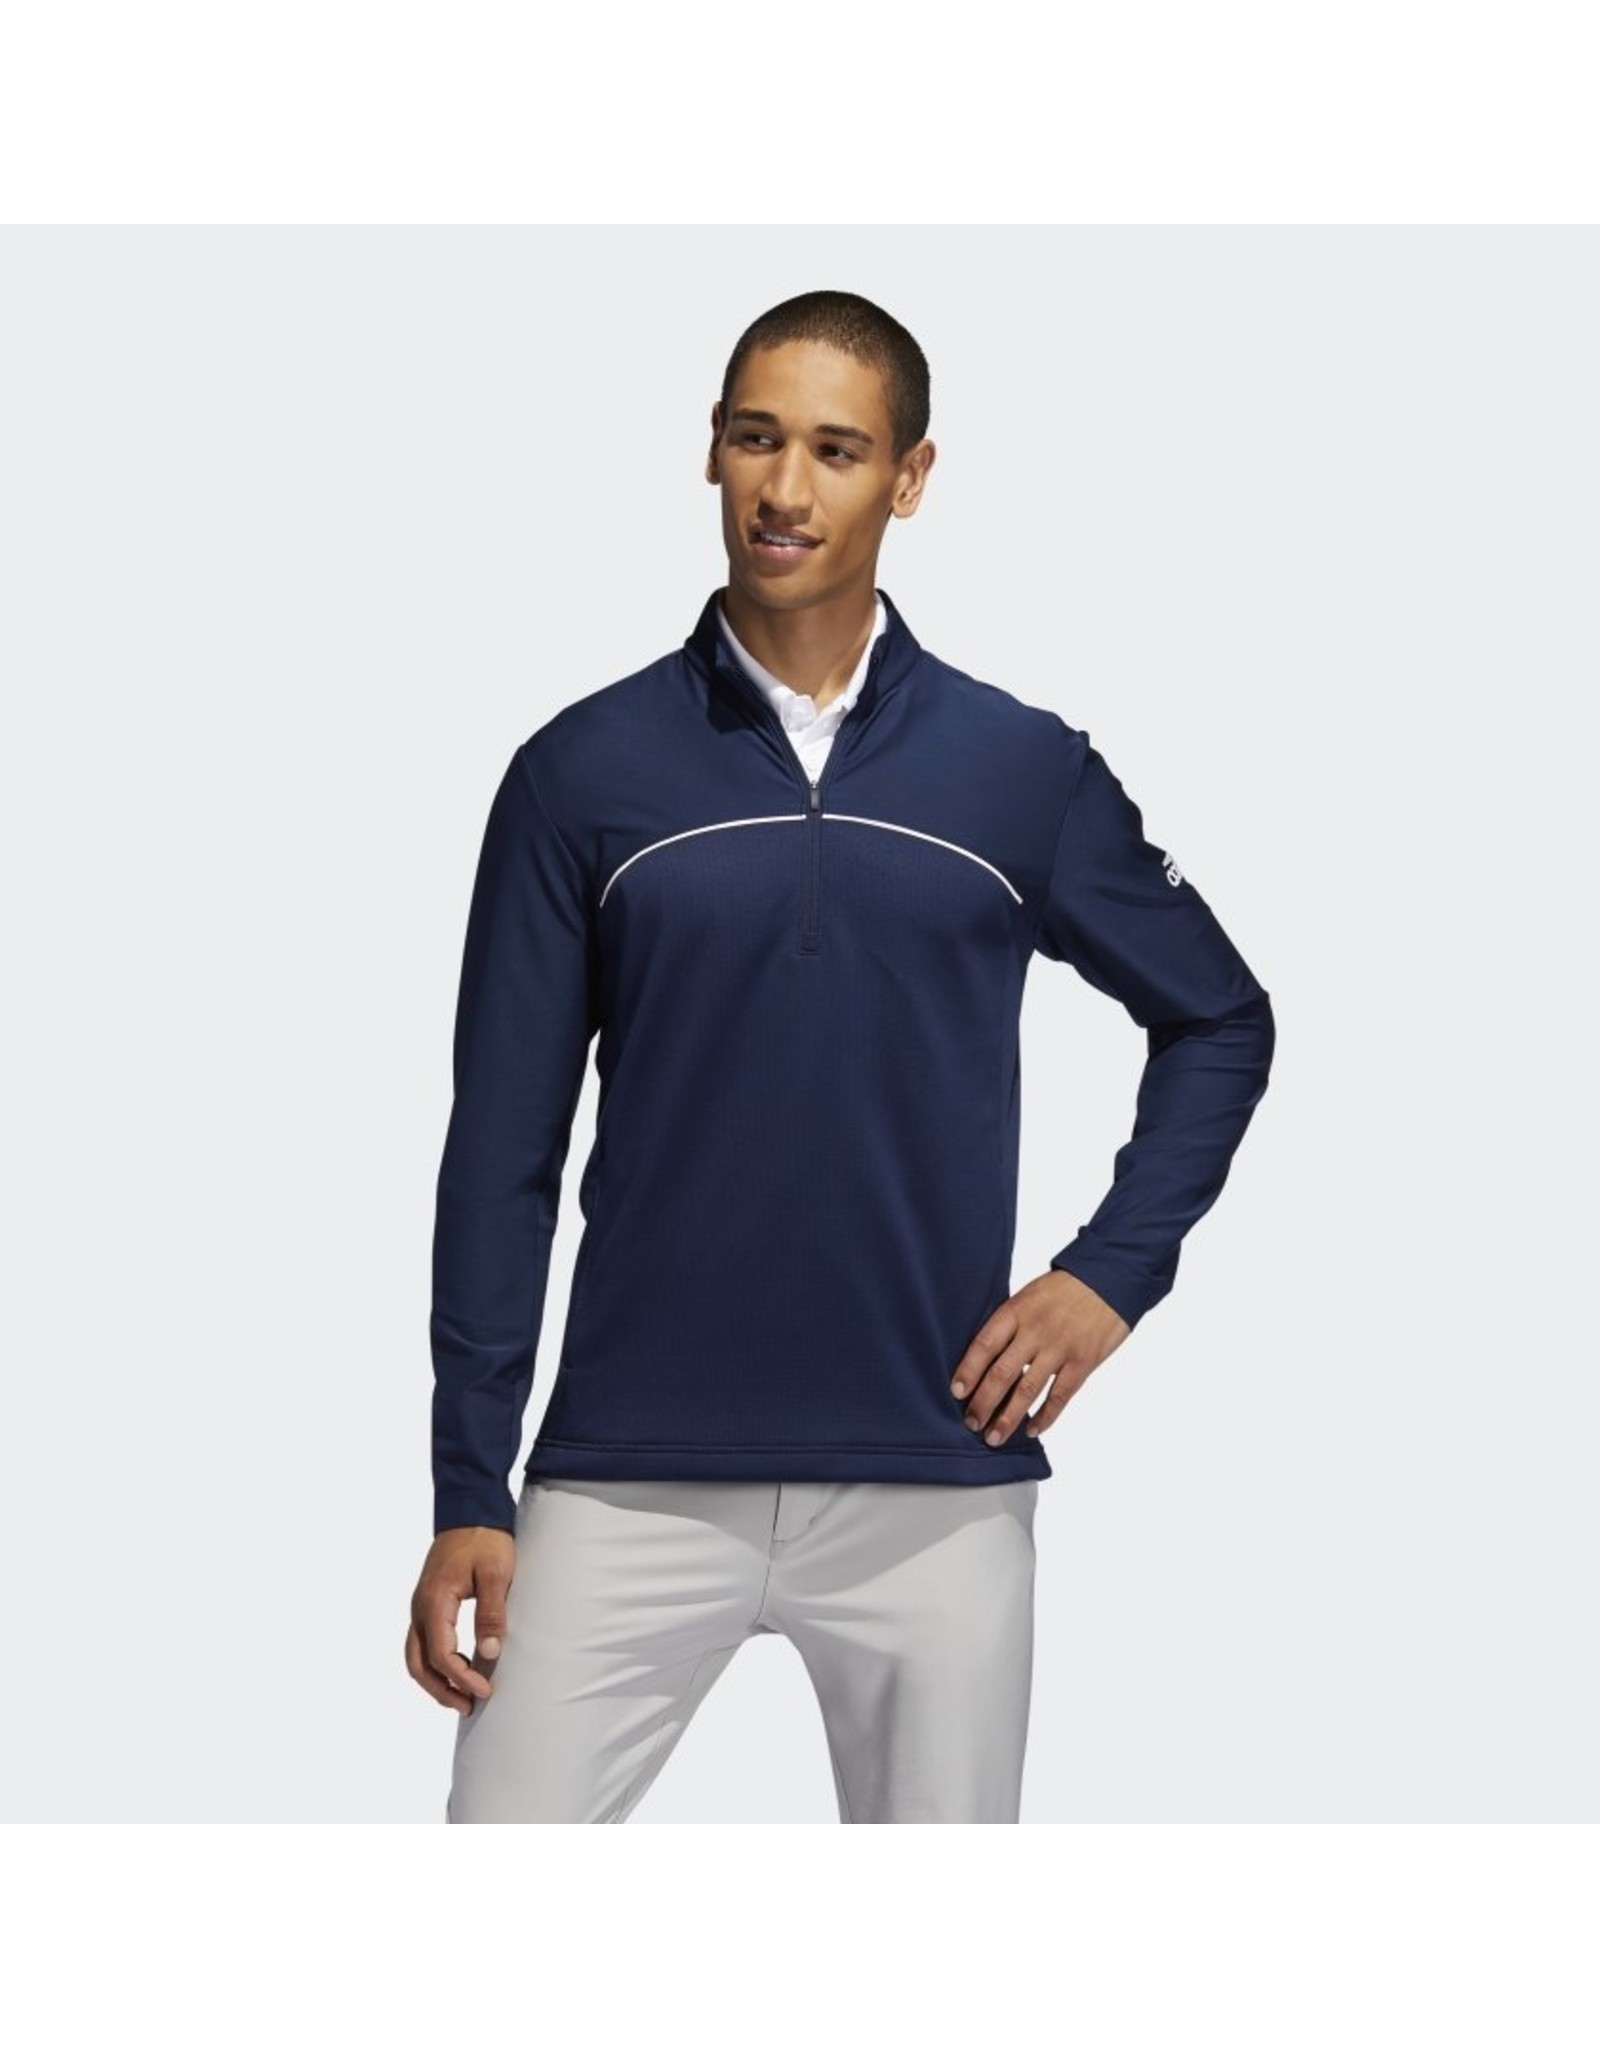 Adidas Jacket Adi 1/4 Zip